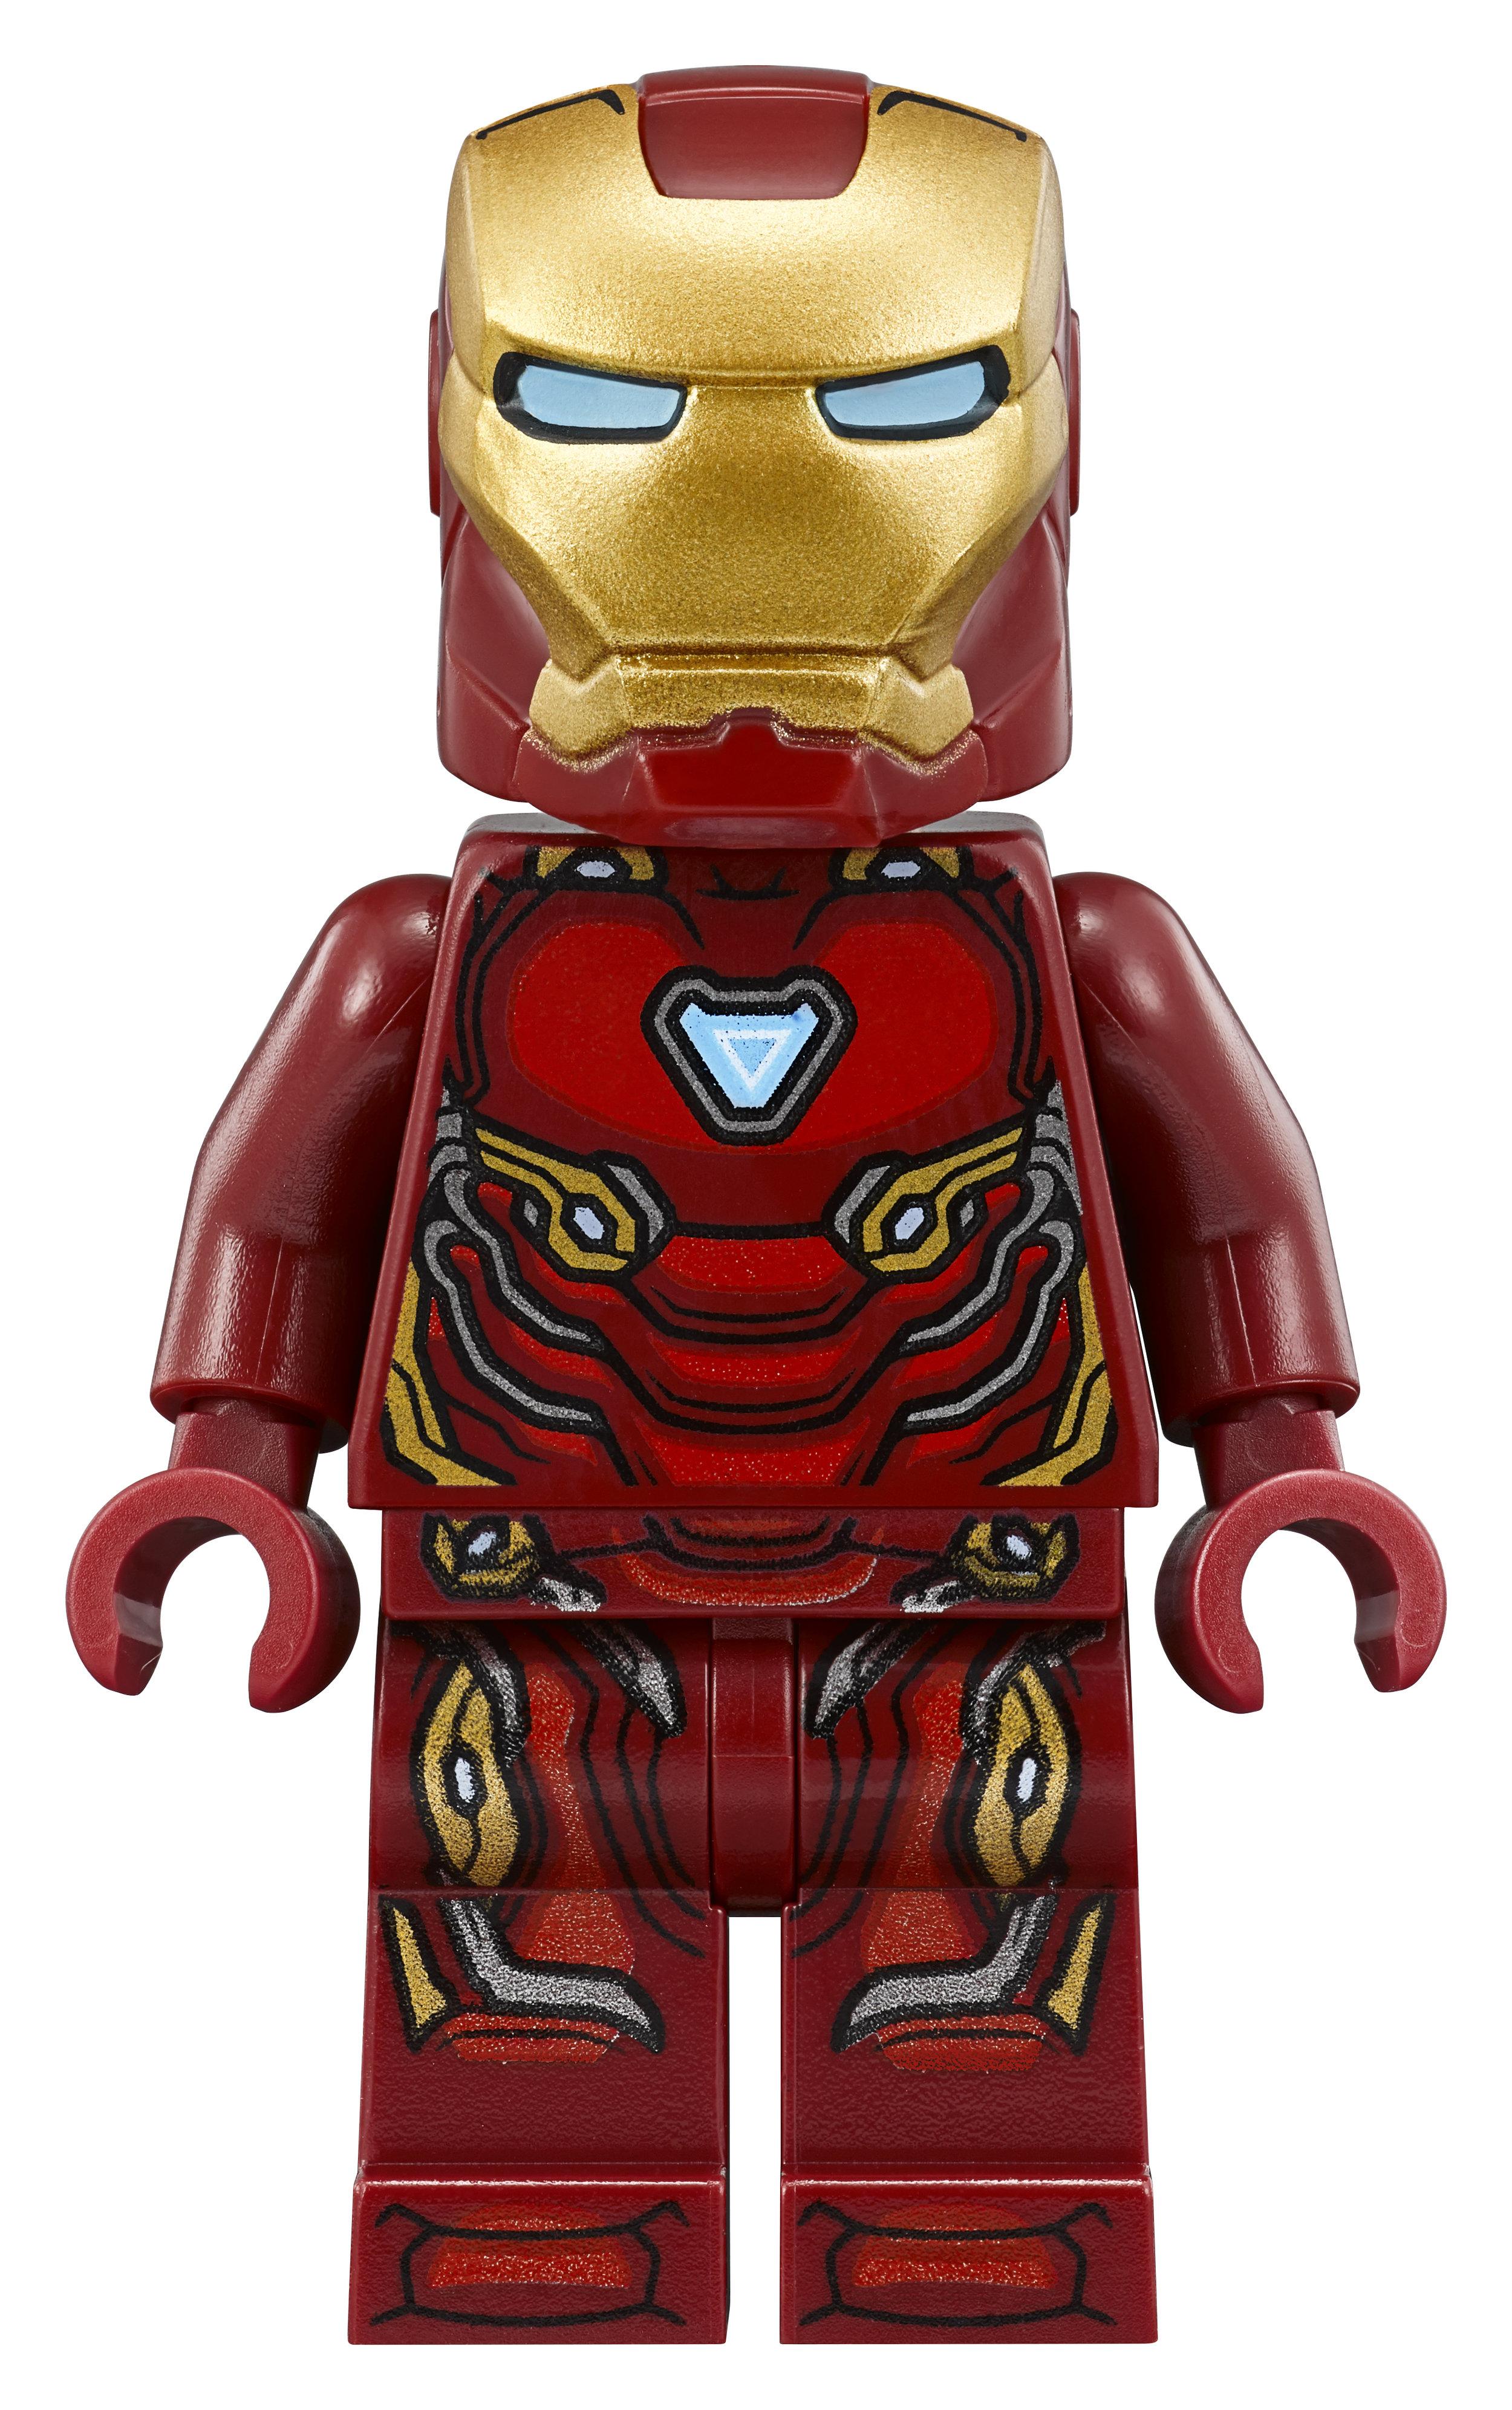 76108_1to1_MF_Iron_Man_A.jpg